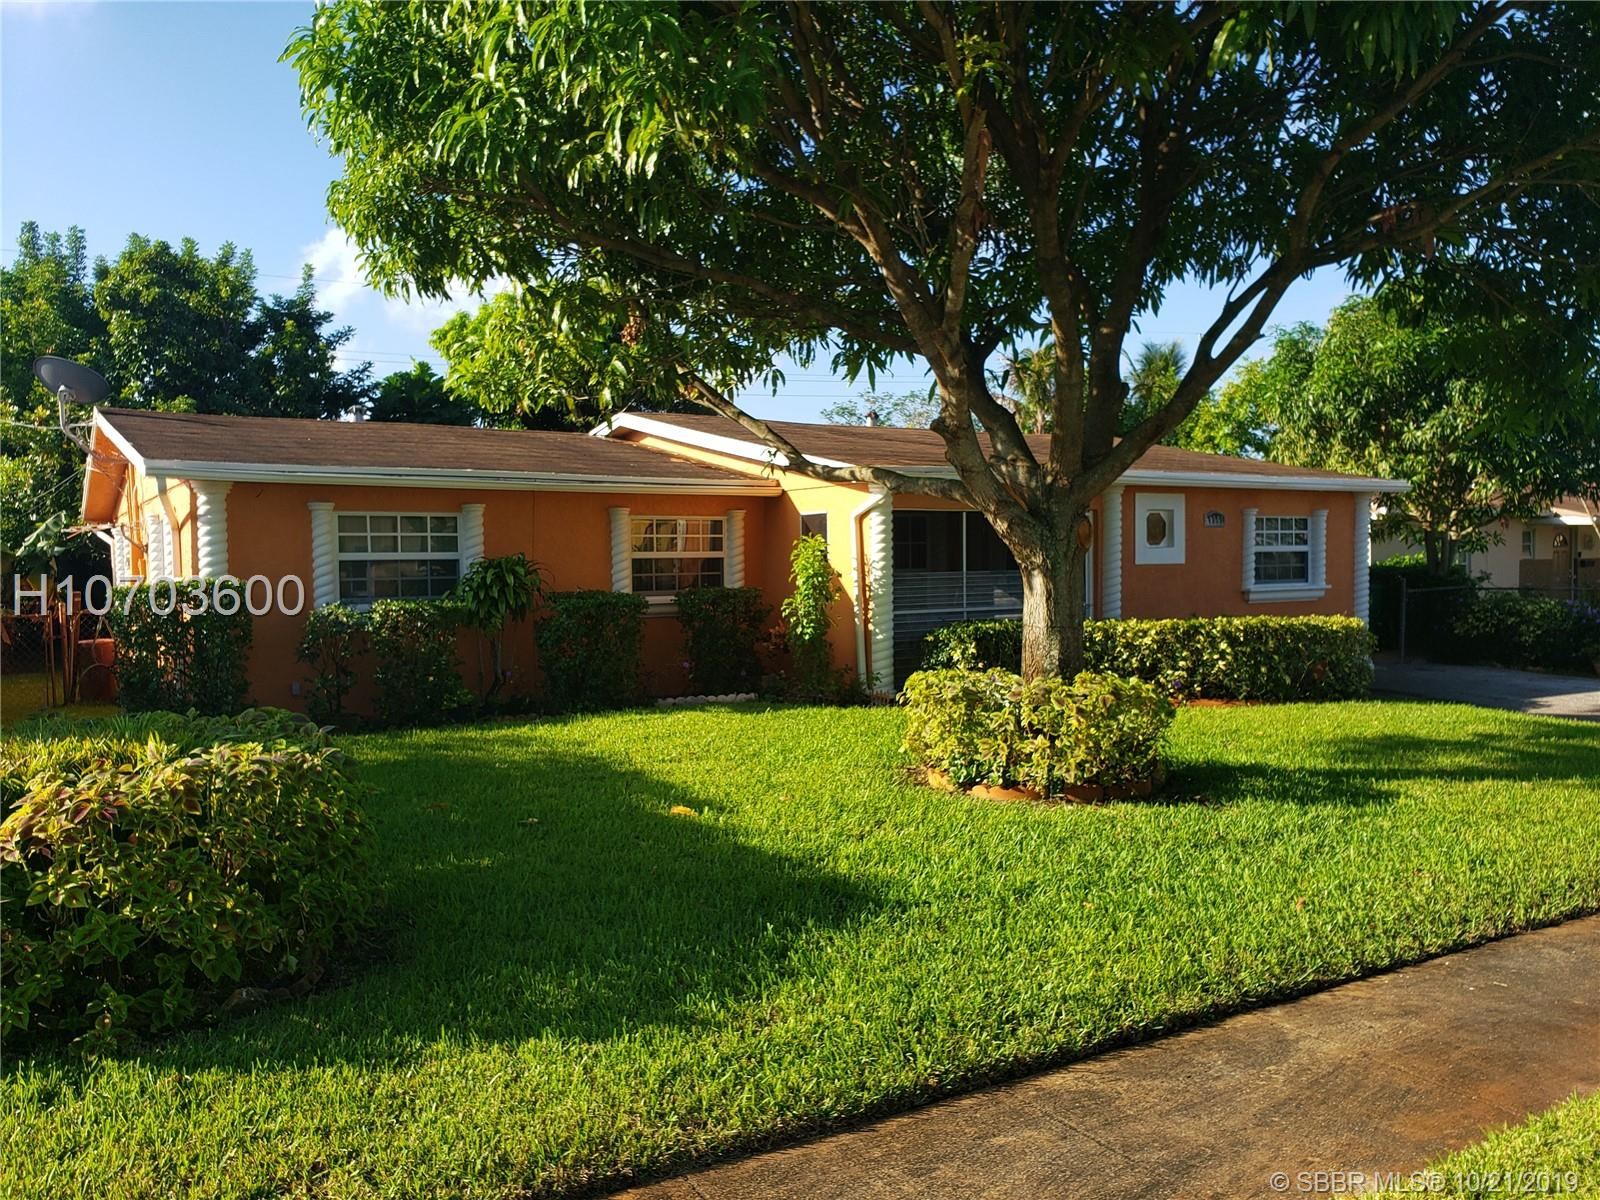 Cheap 3760 Real Estate